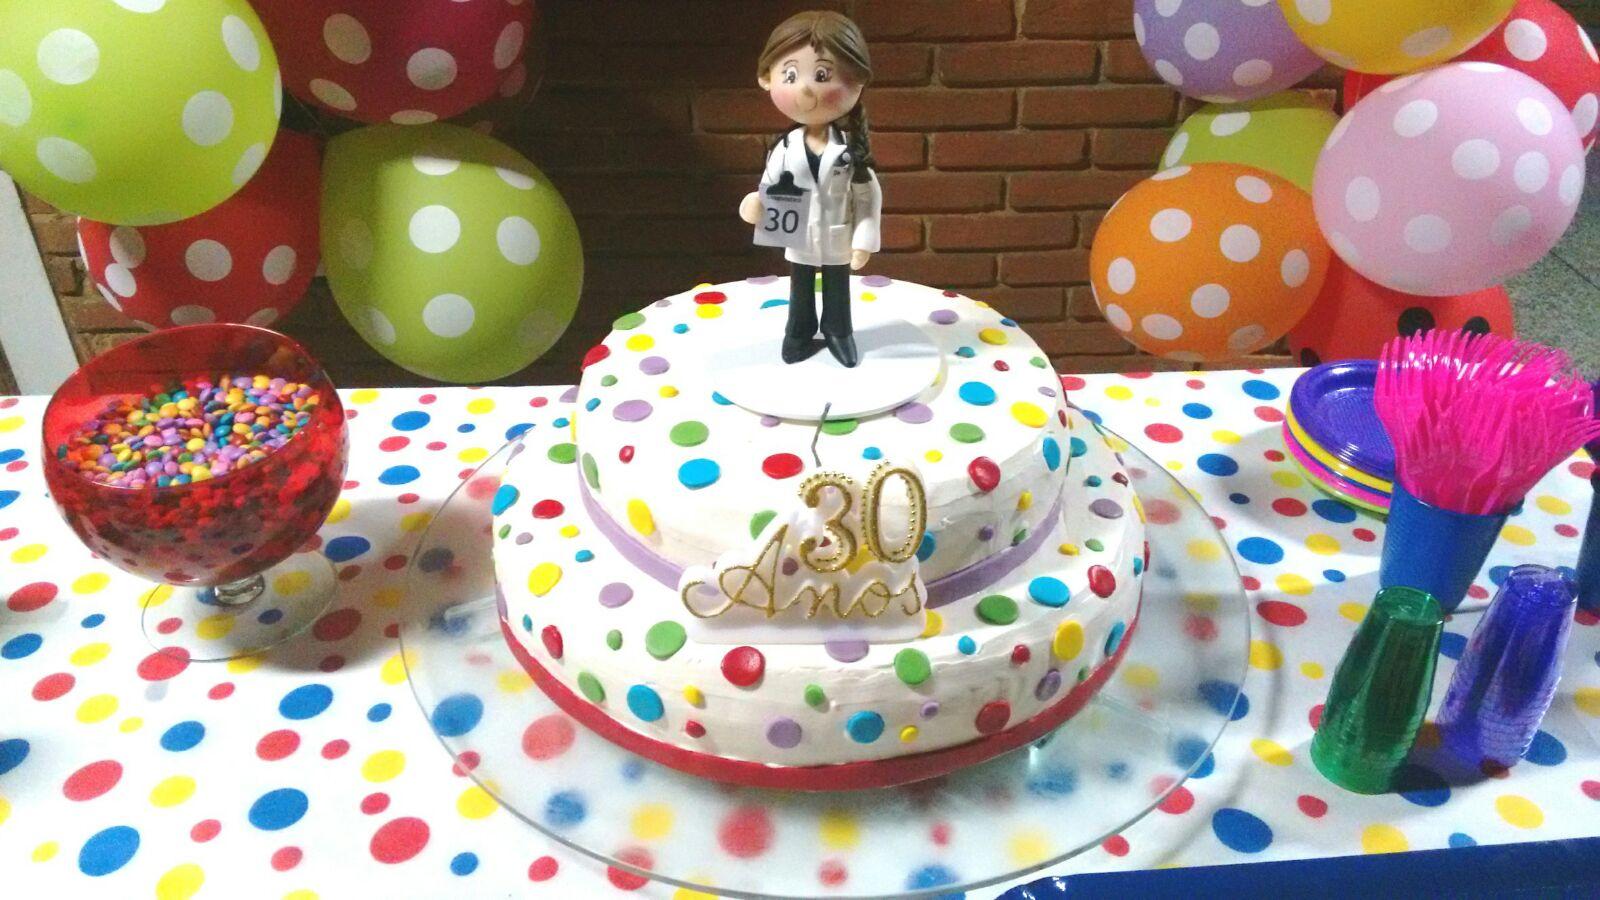 Topo de bolo aniversrio de 30 anos snia biscuit topo de bolo aniversrio 30 anos mdica biscuit mdico altavistaventures Images